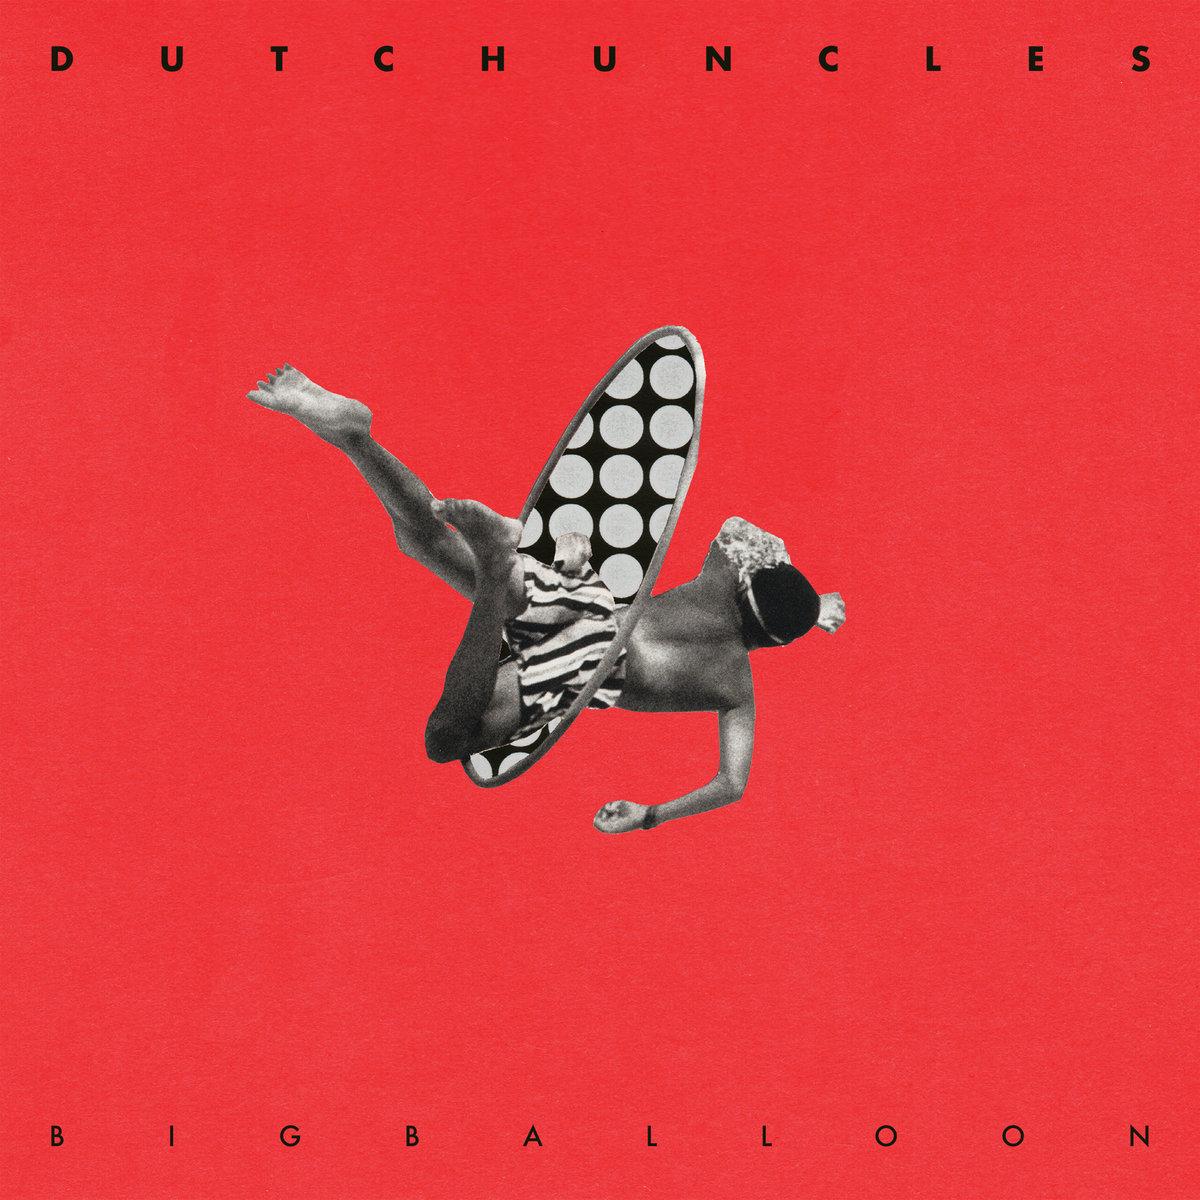 big balloon dutch uncles